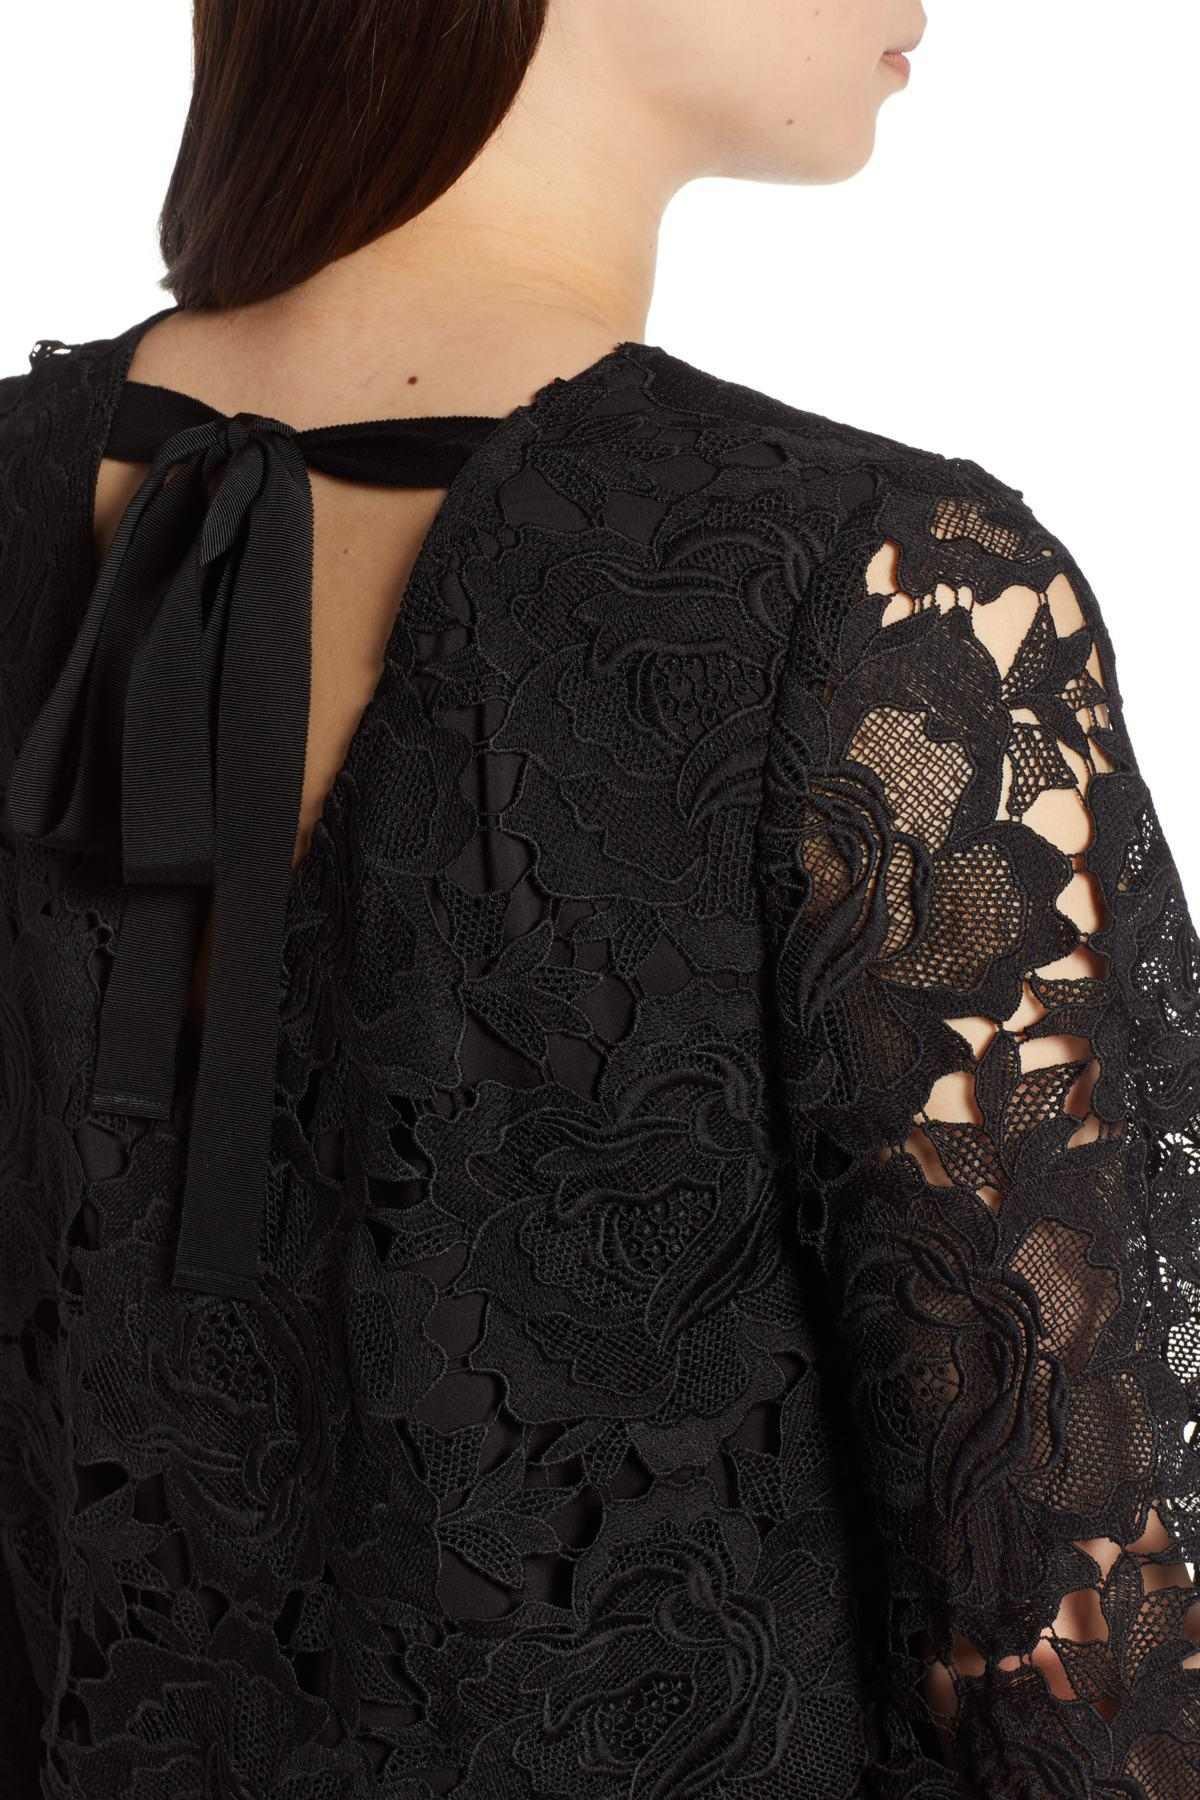 871a6515729 Halogen - Black (r) Lace Blouse (regular   Petite) - Lyst. View fullscreen